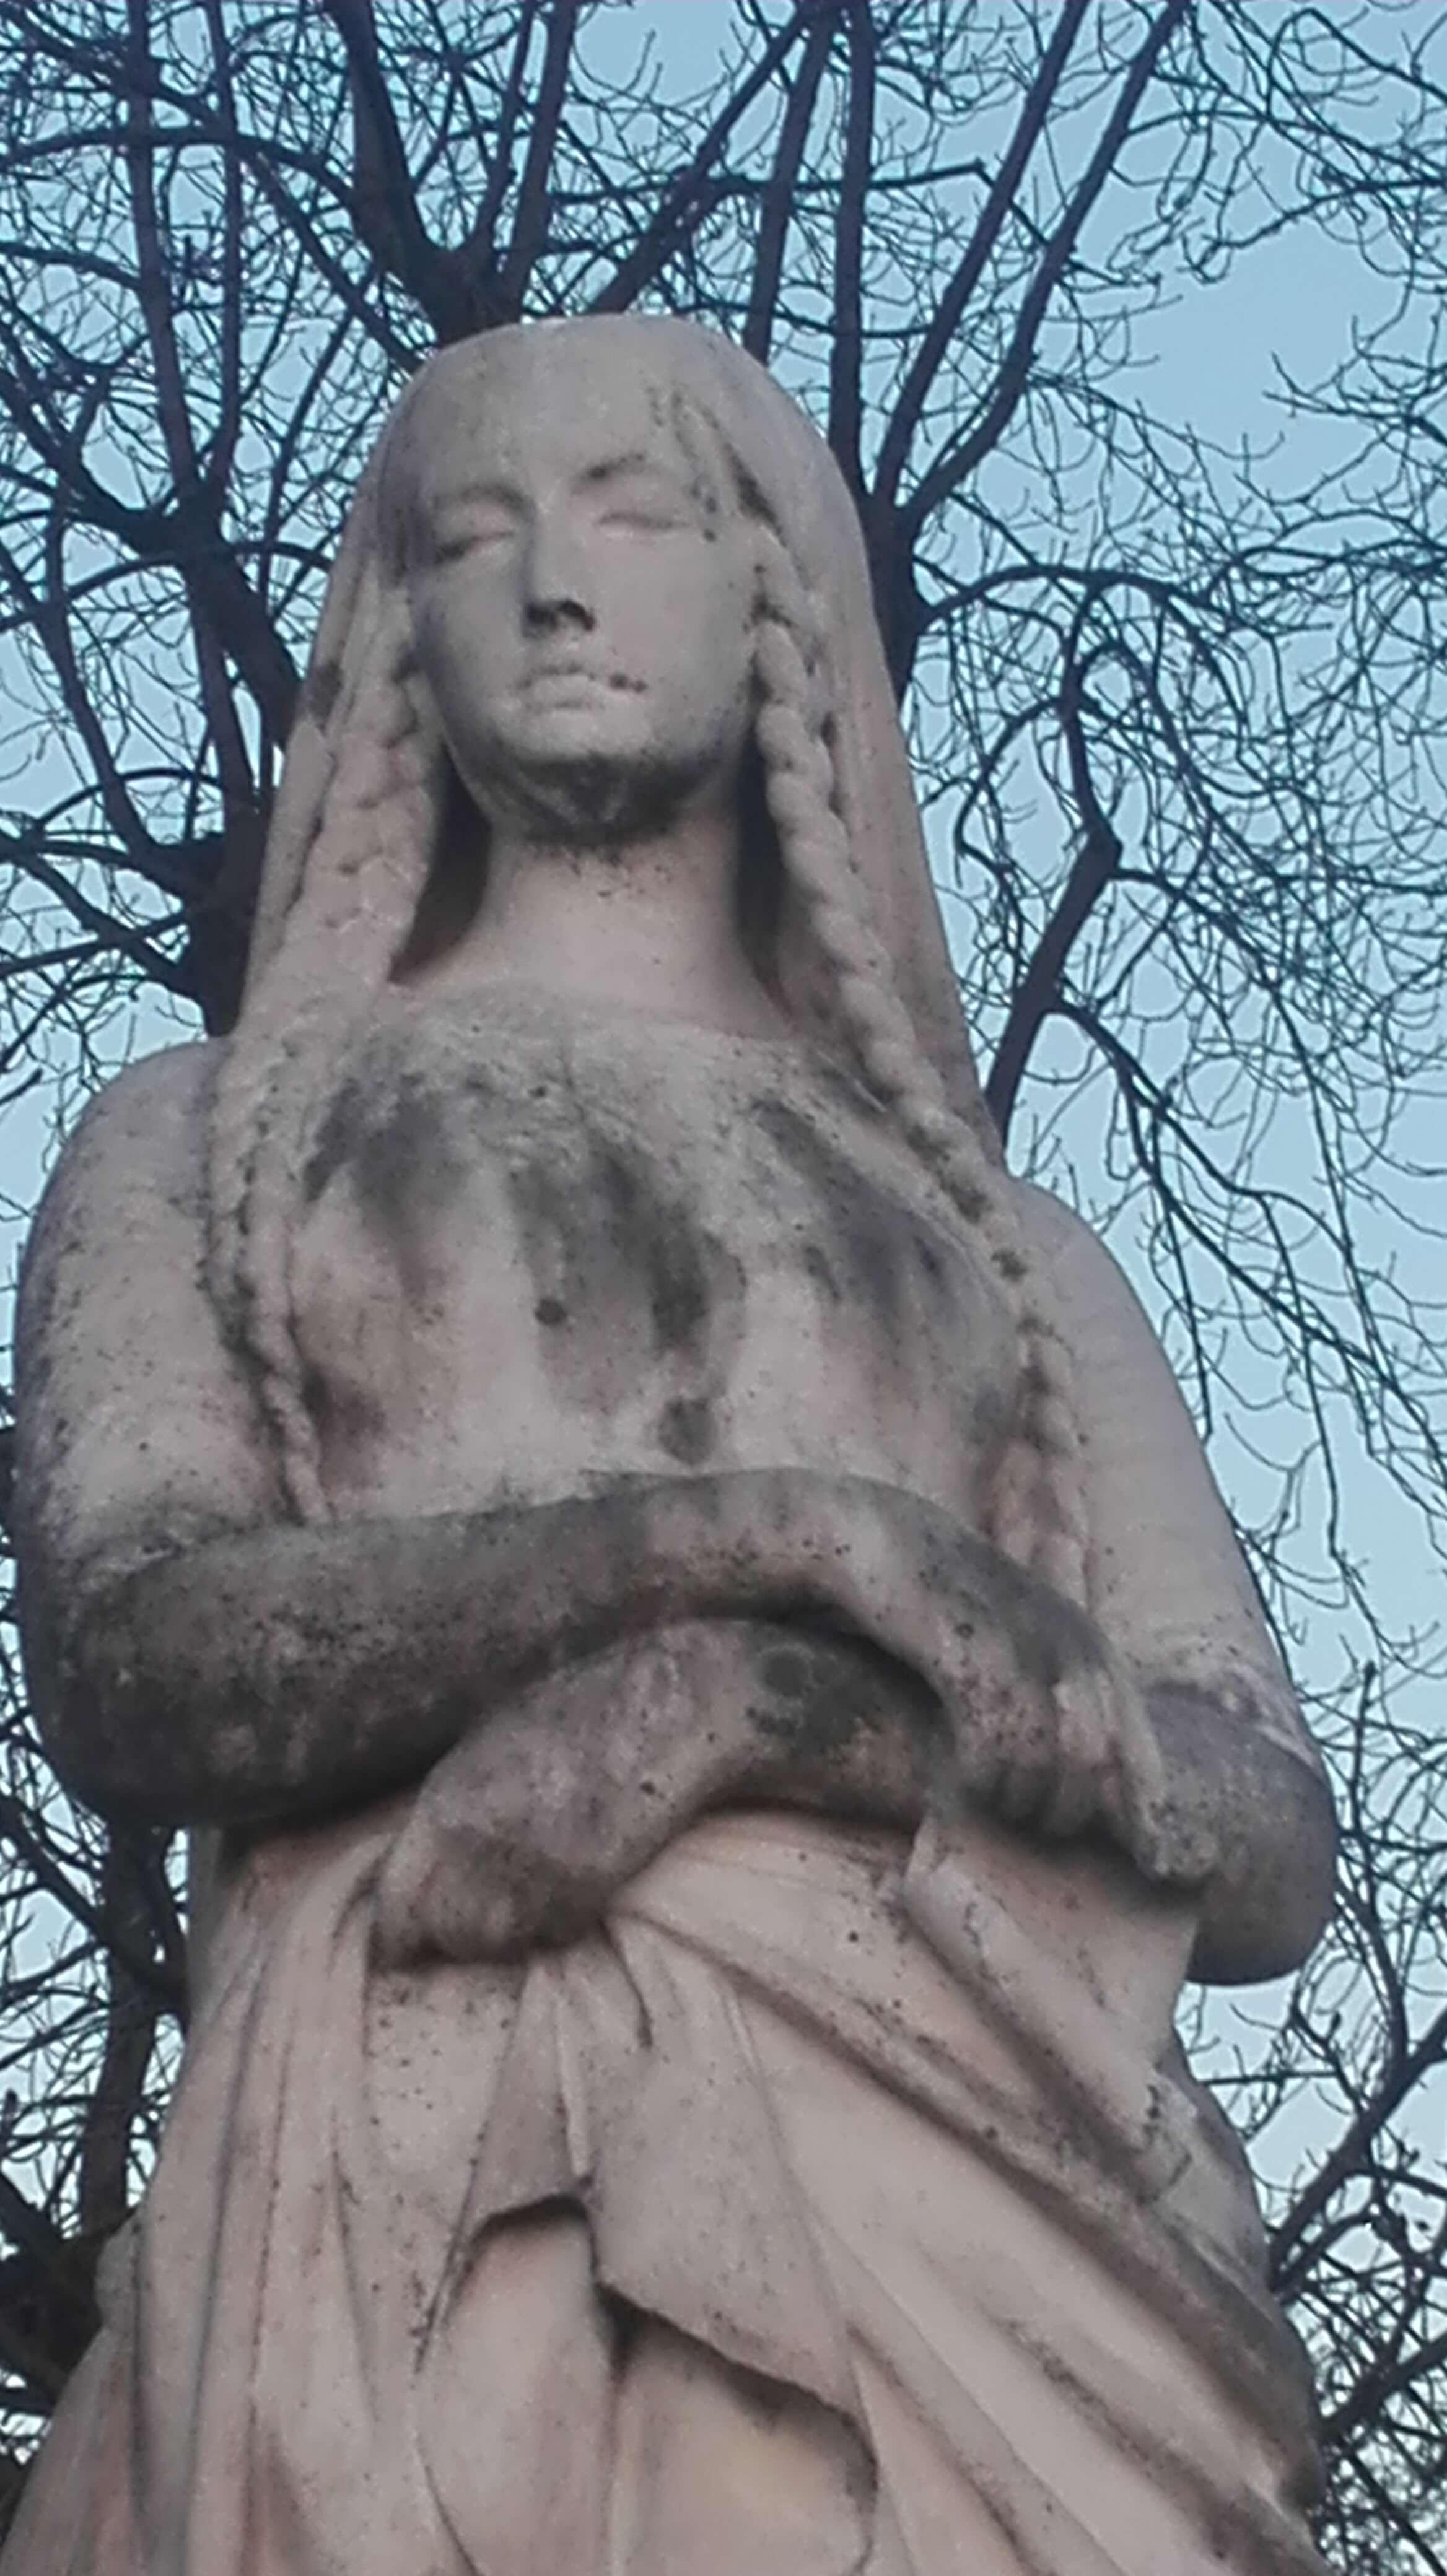 Sainte-Geneviève